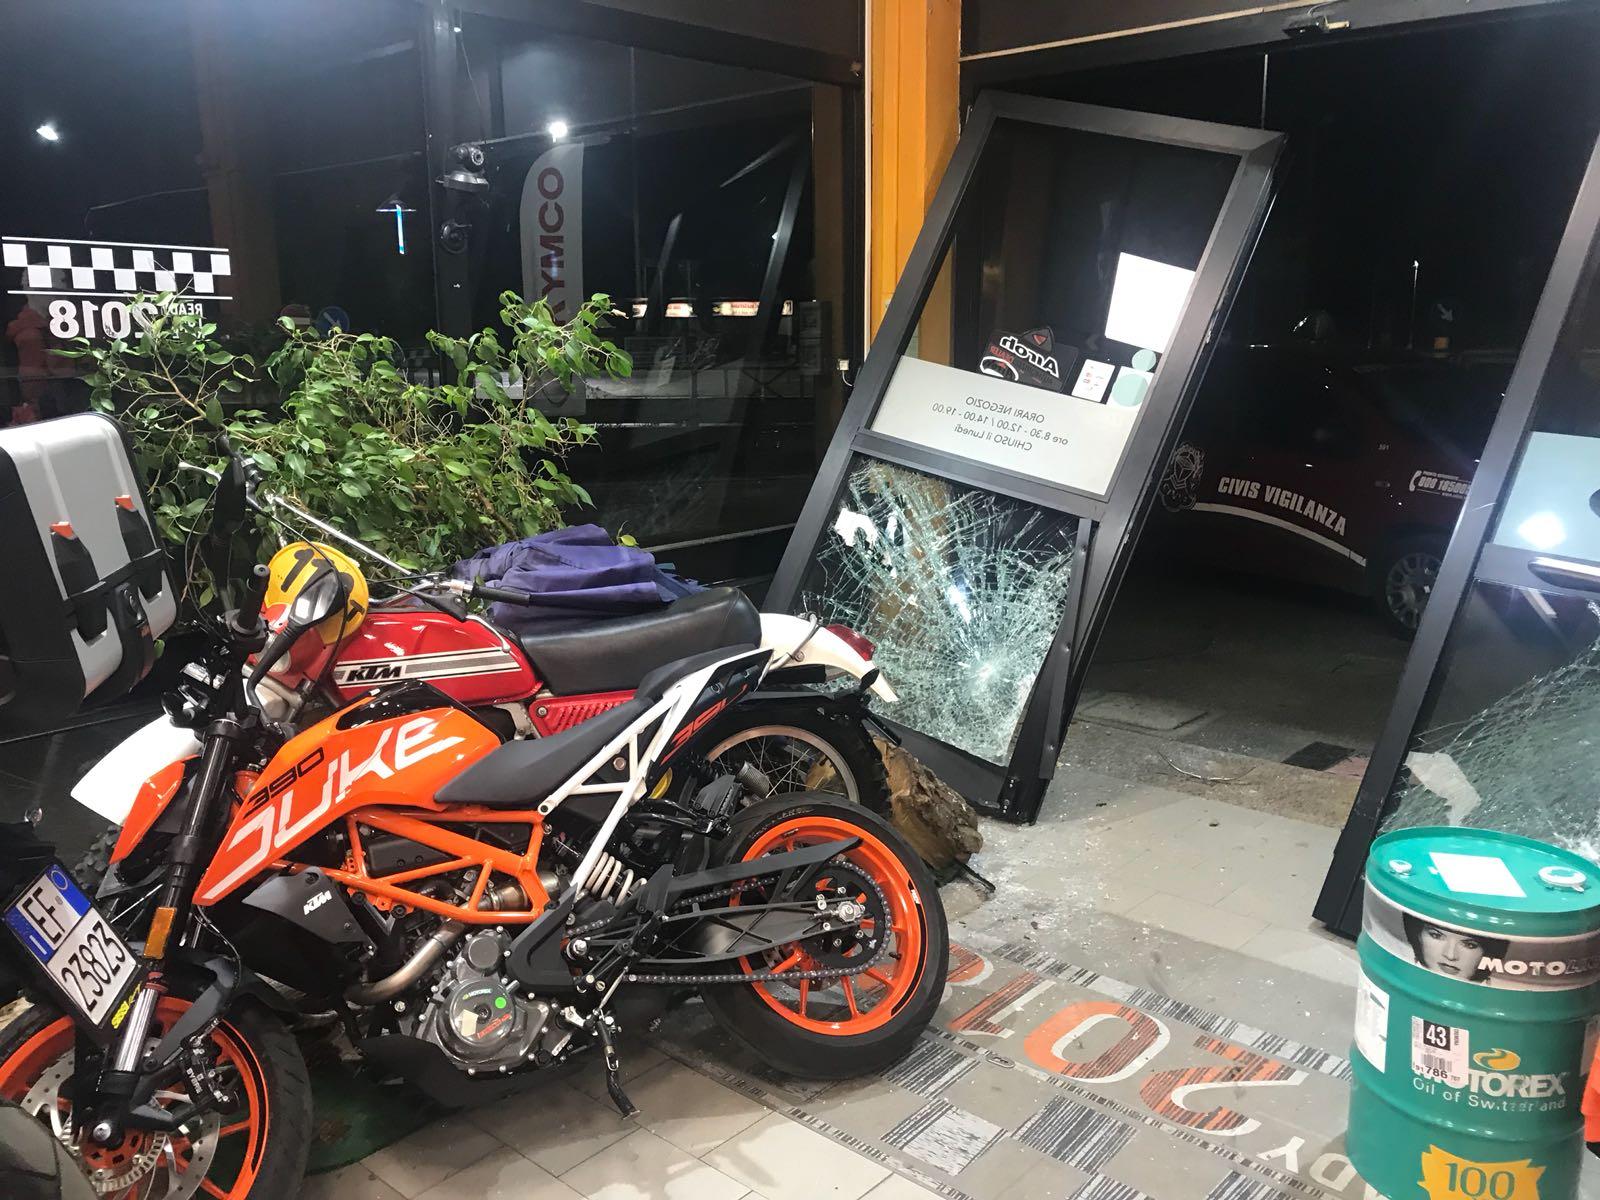 Crema News - Rubate 4 moto alla Sissi Motor, valore 40mila euro